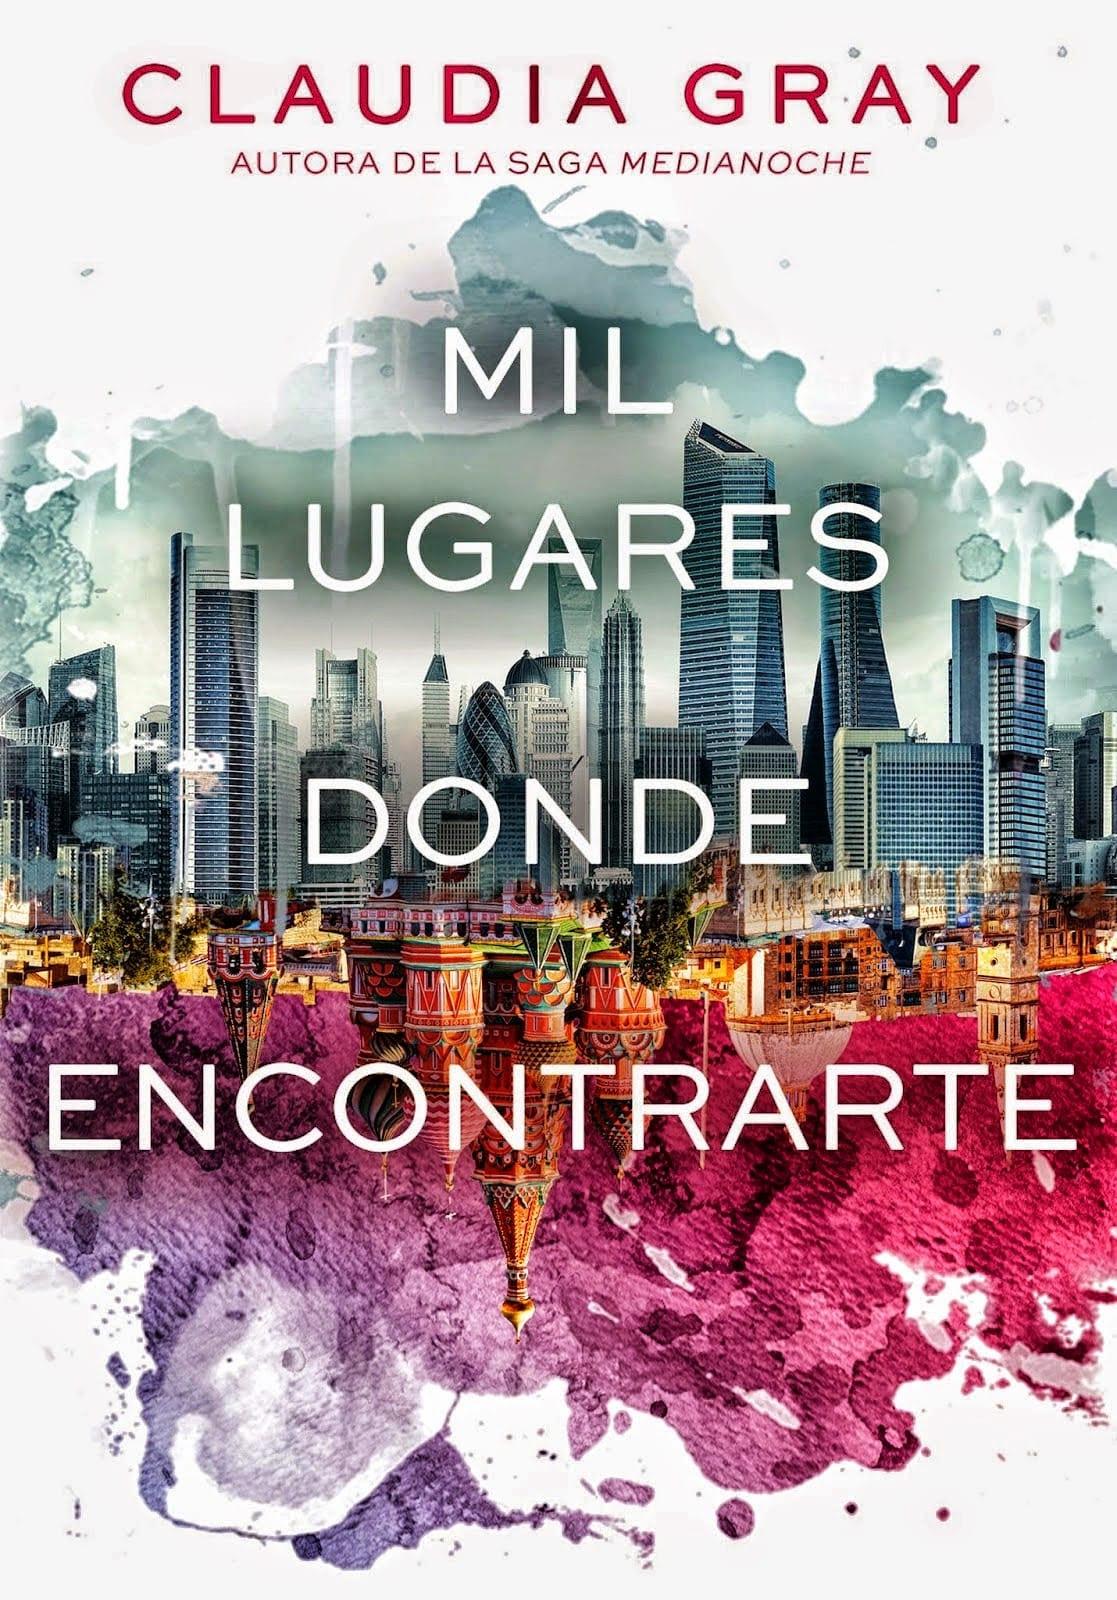 http://entremetaforas.es/wp-content/uploads/2015/05/Mil-lugares-donde-encontrarte-Claudia-Gray-Libros-con-alma.jpg